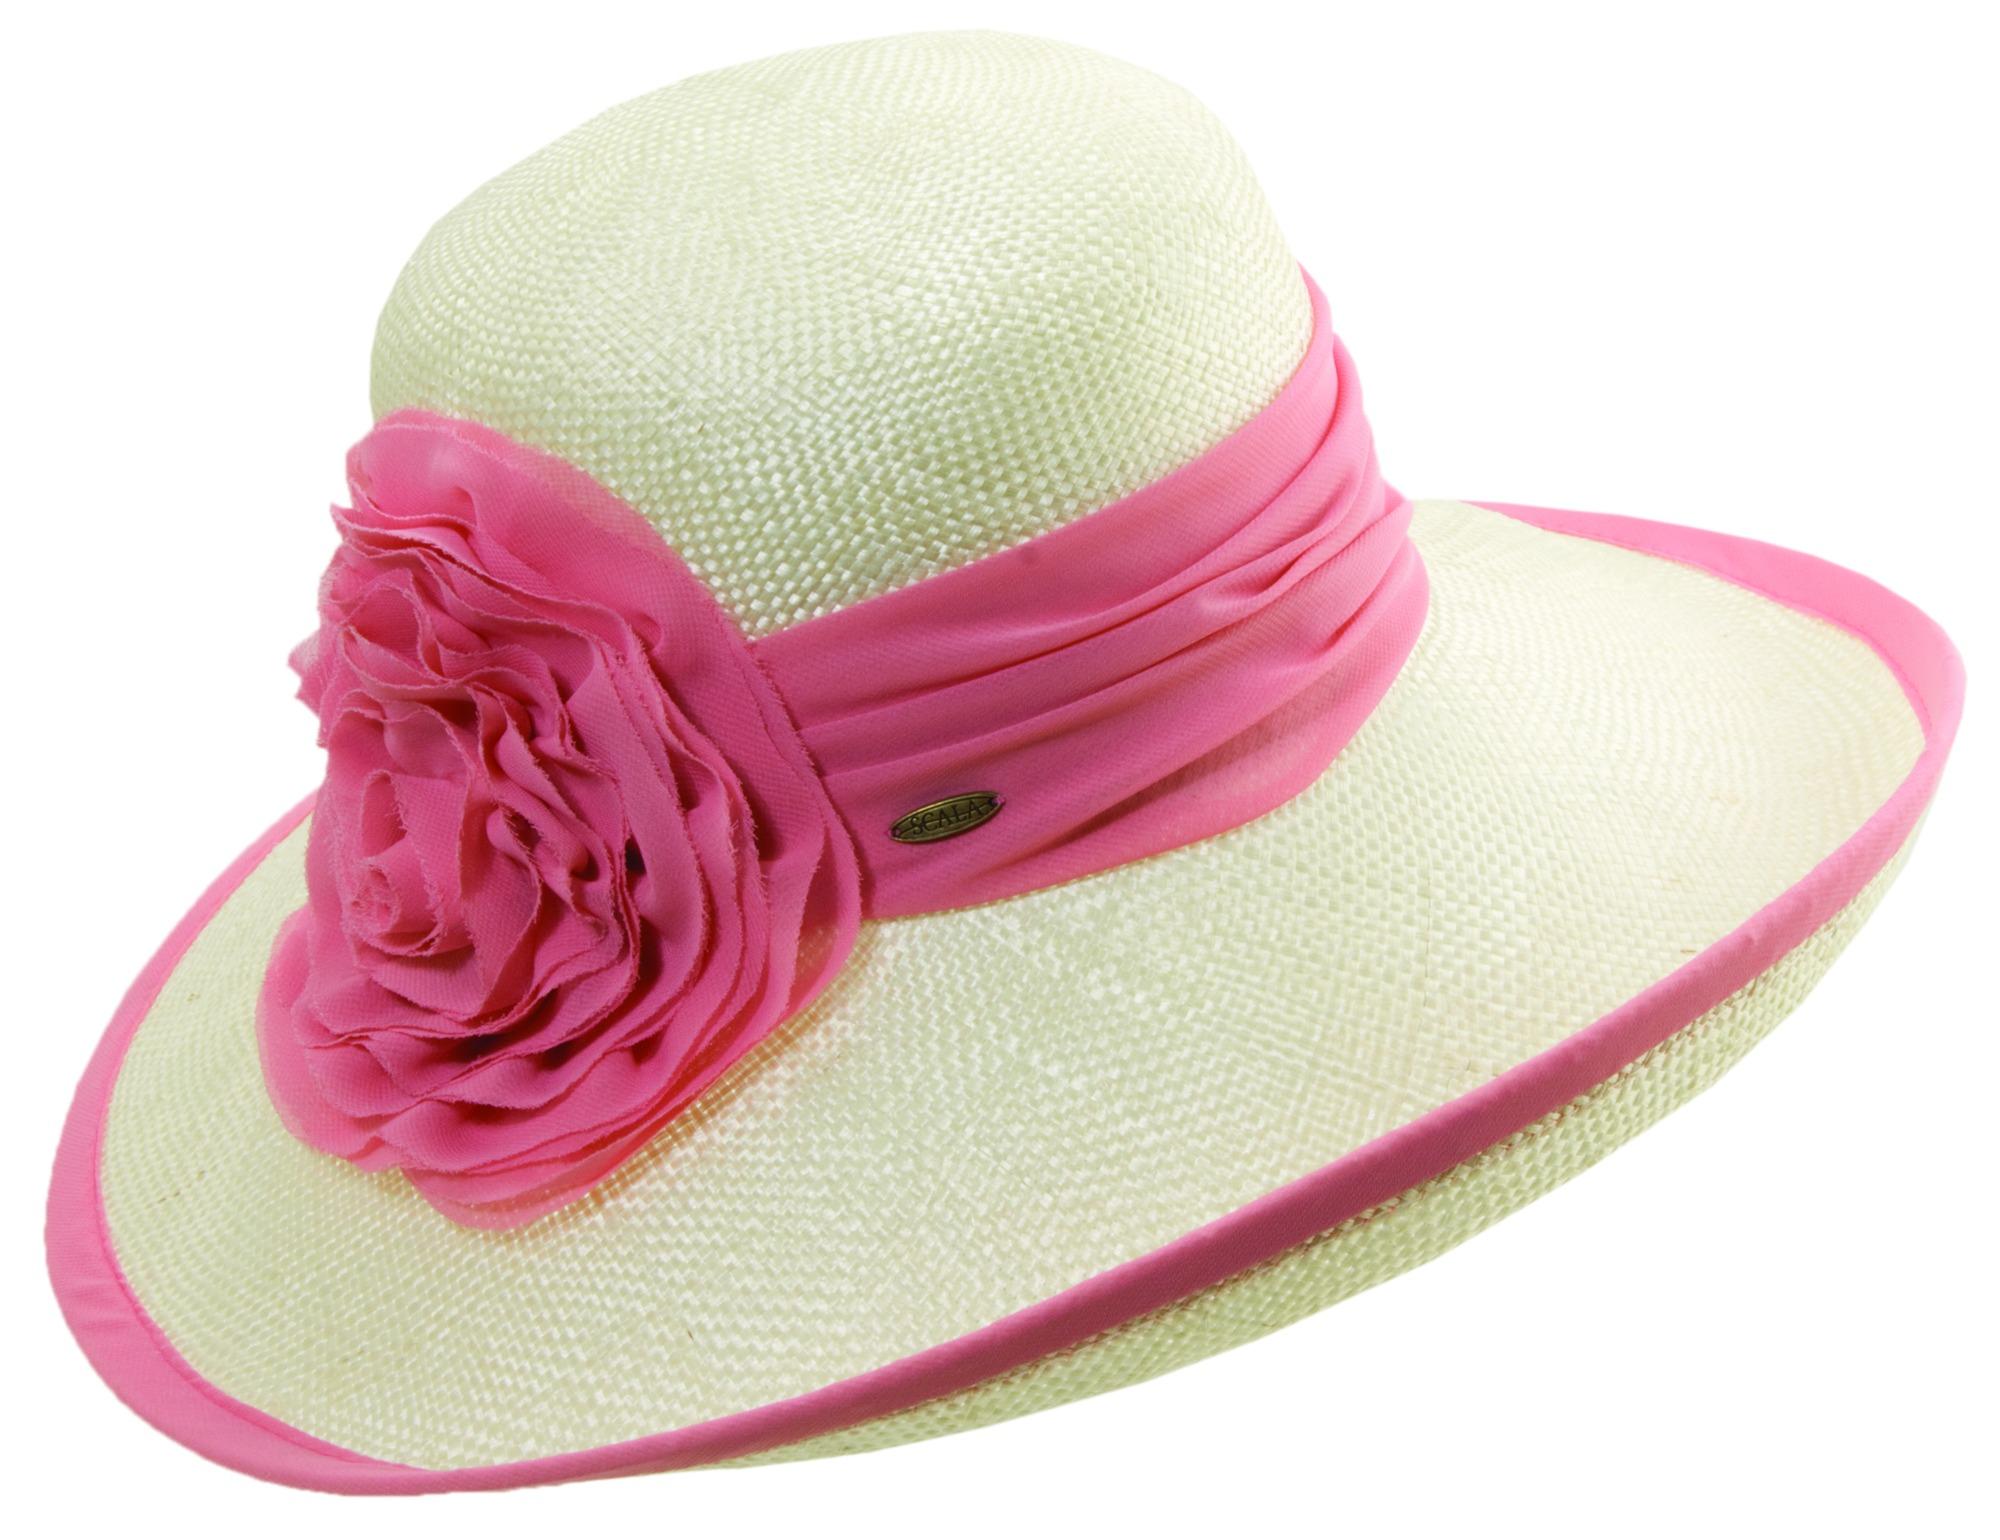 ladies hats images big hats for ladies | new-sisal big brim w/chiffon rosettetrim- lvxxndb